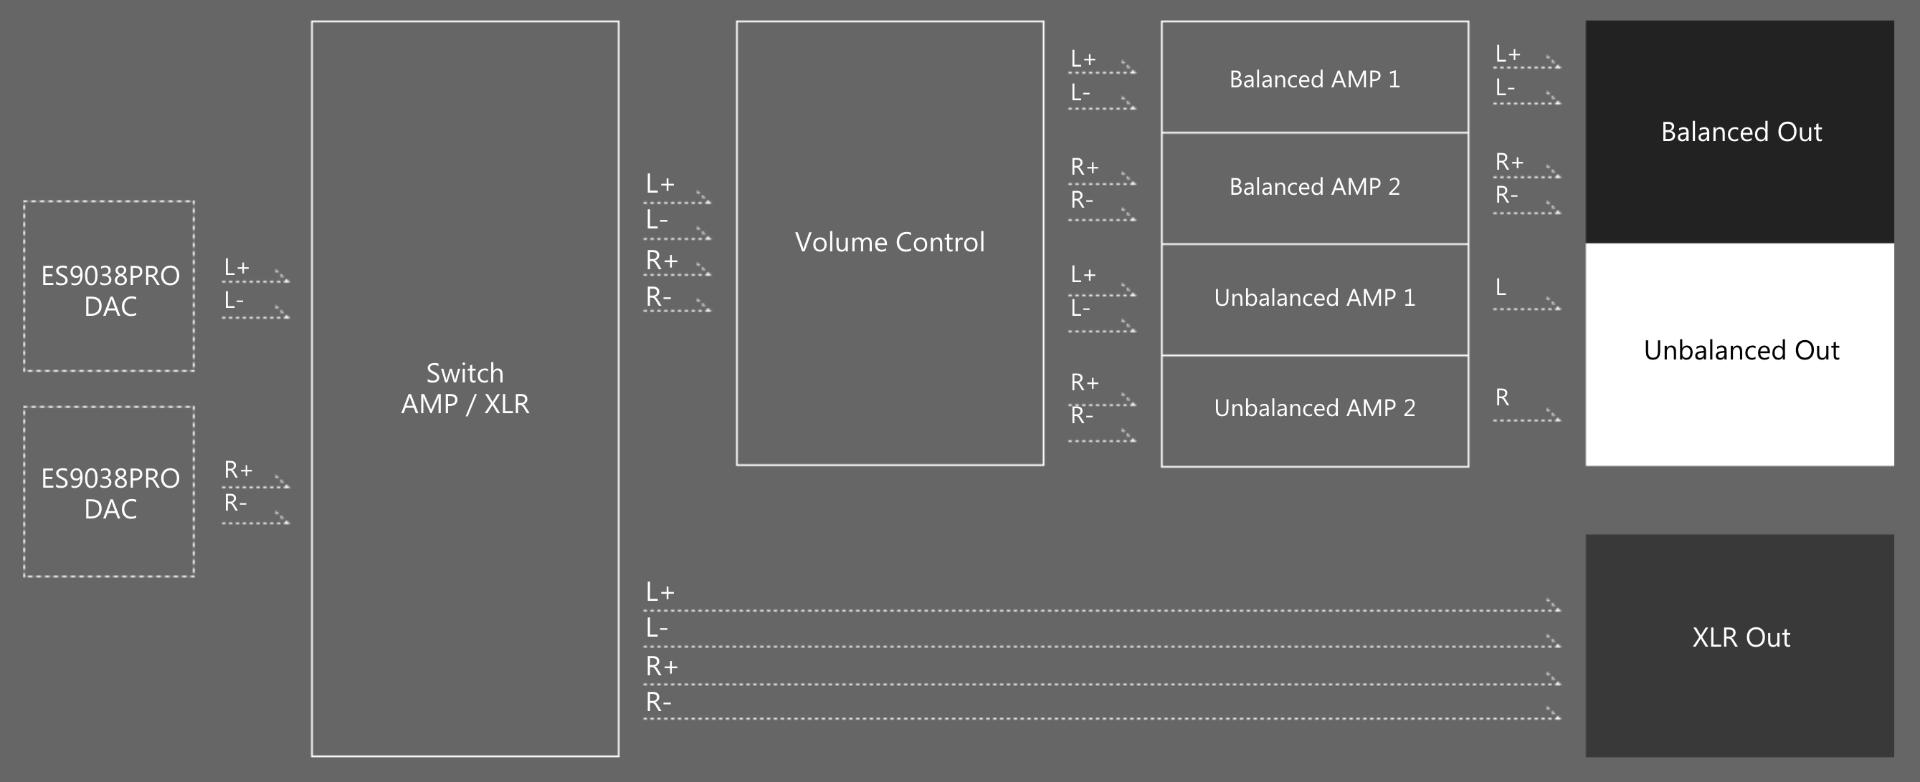 KANN CUBE component diagram